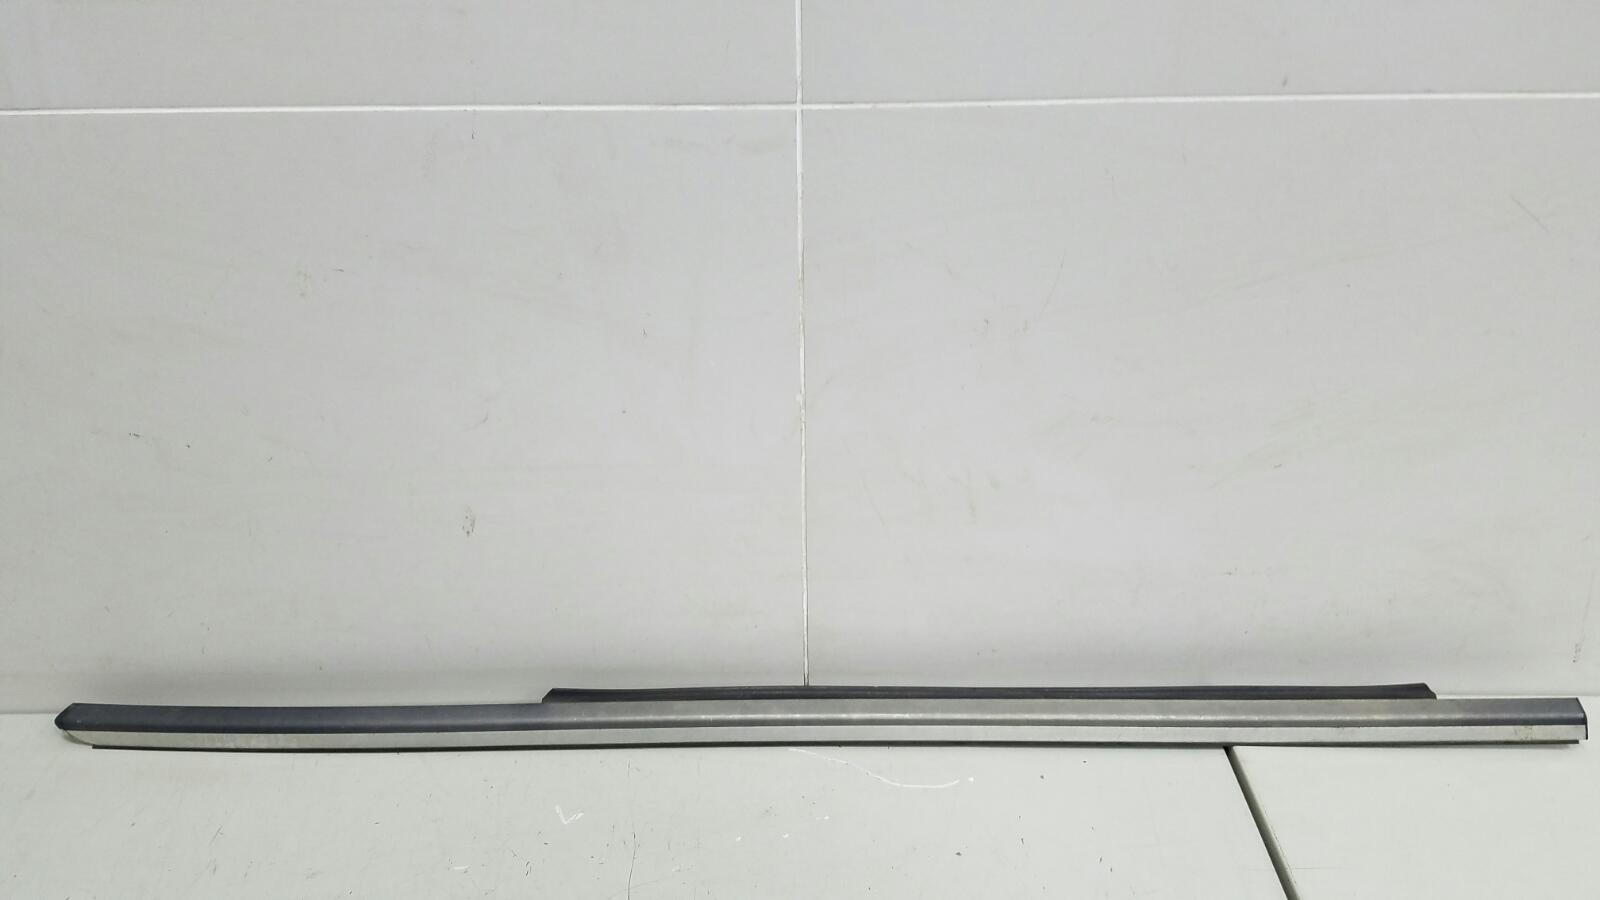 Уплотнитель стекла двери наружний Mercedes S320 Cdi W220 OM 613.960 2000 передний